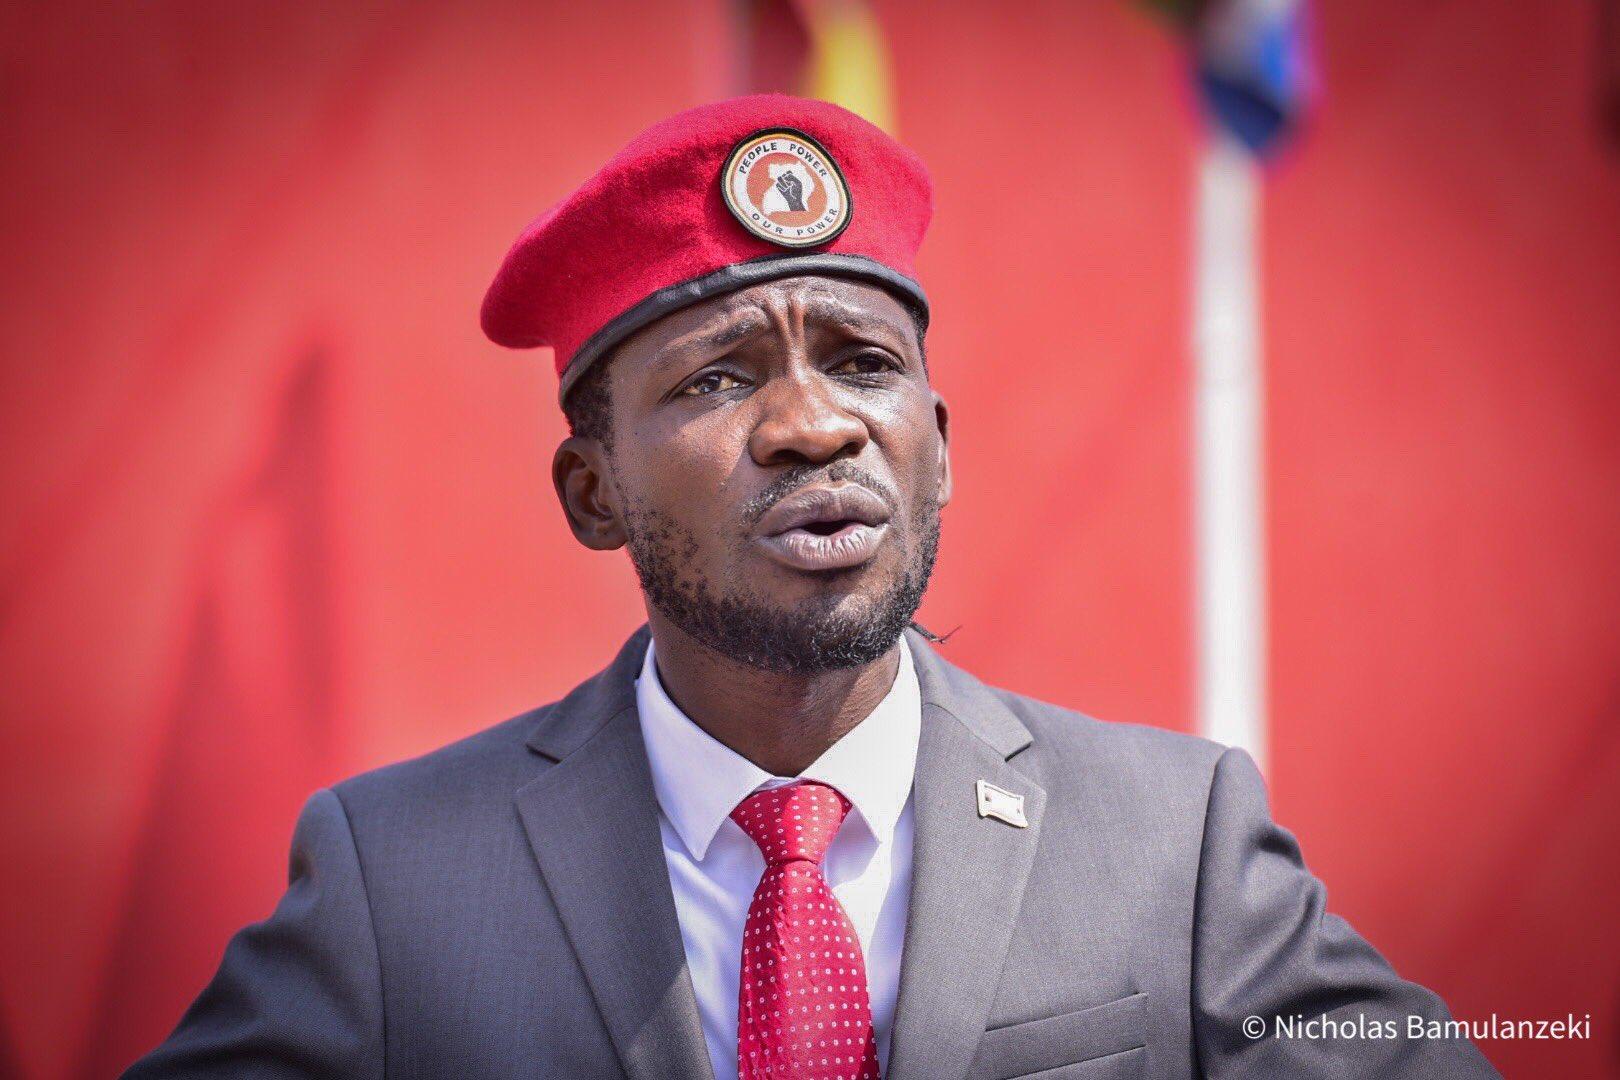 "𝐔𝐆 𝐋𝐨𝐯𝐞𝐫™ 🇺🇬 on Twitter: ""Ugandans Tebakyalina Maaalo Galli agaa  bye Muzungu nga Bamulabyeko These people are awake and they won't stop the  struggle They are nolonger in the shadows #BobiWineNominated…  https://t.co/0AaPf0g1w9"""